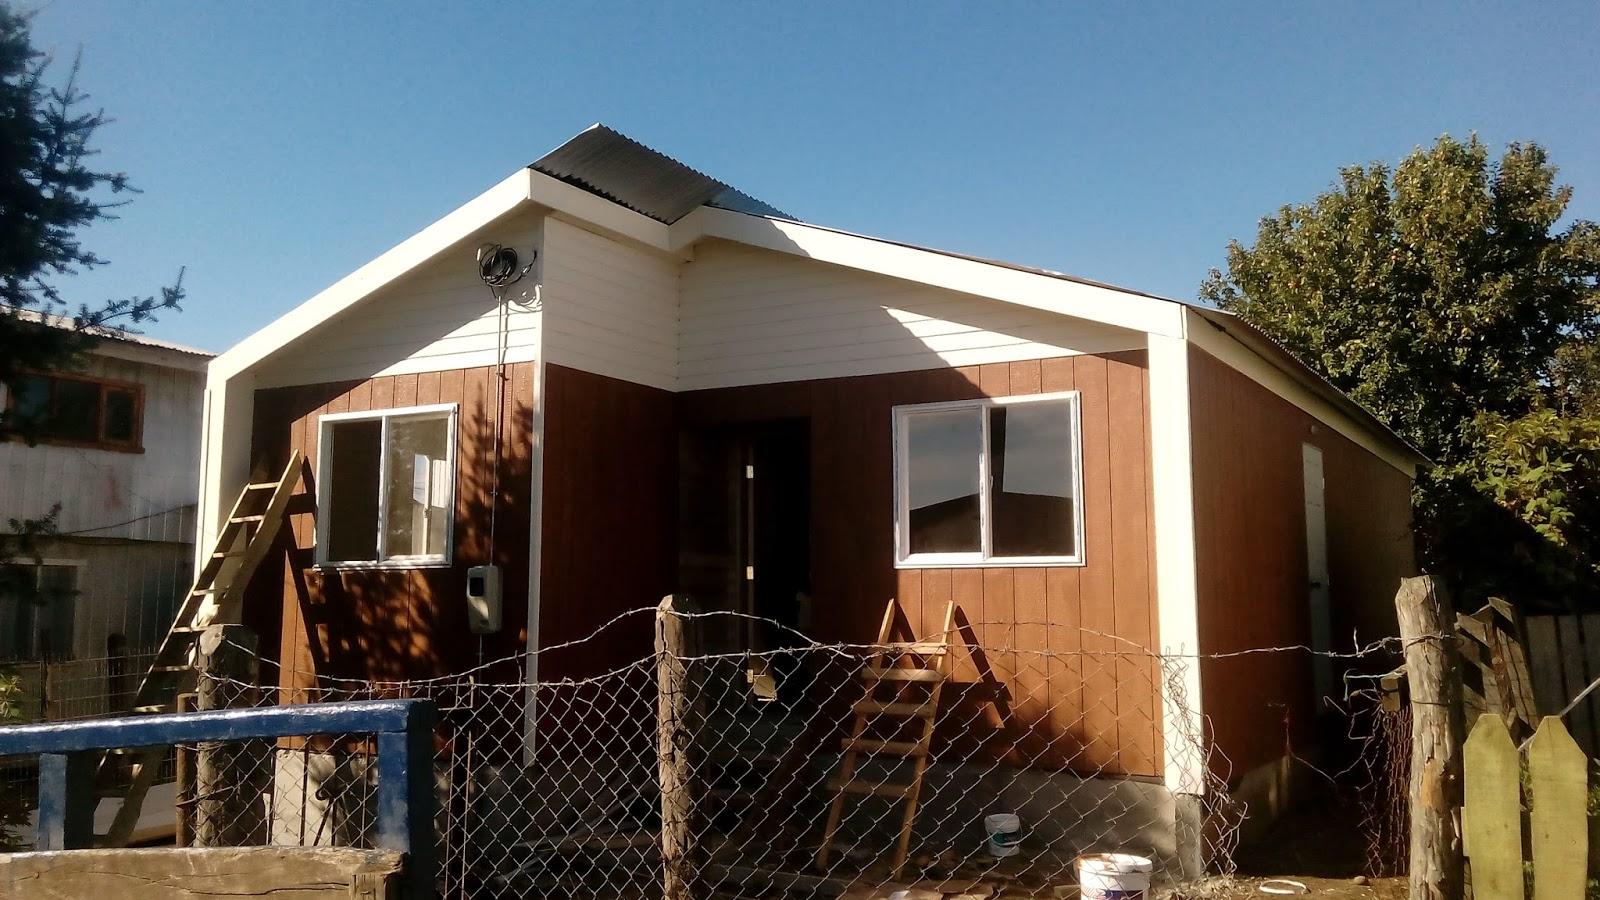 Fr construcciones pintura de casas exterior for Pintura casa exterior 2017